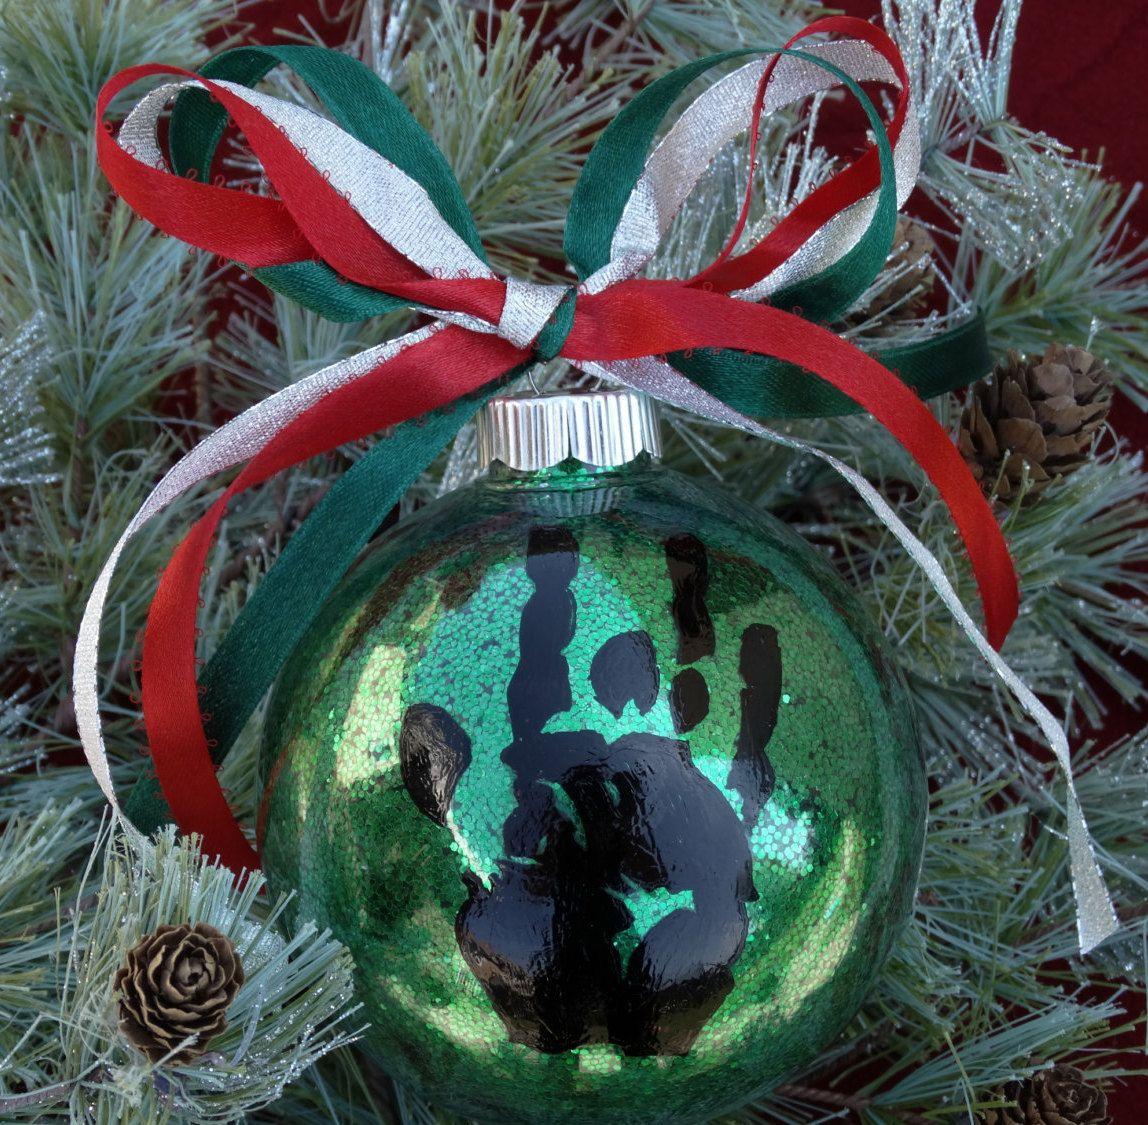 Jerry Garcia Hand Print Ornament/Grateful Dead Christmas Ornament ...